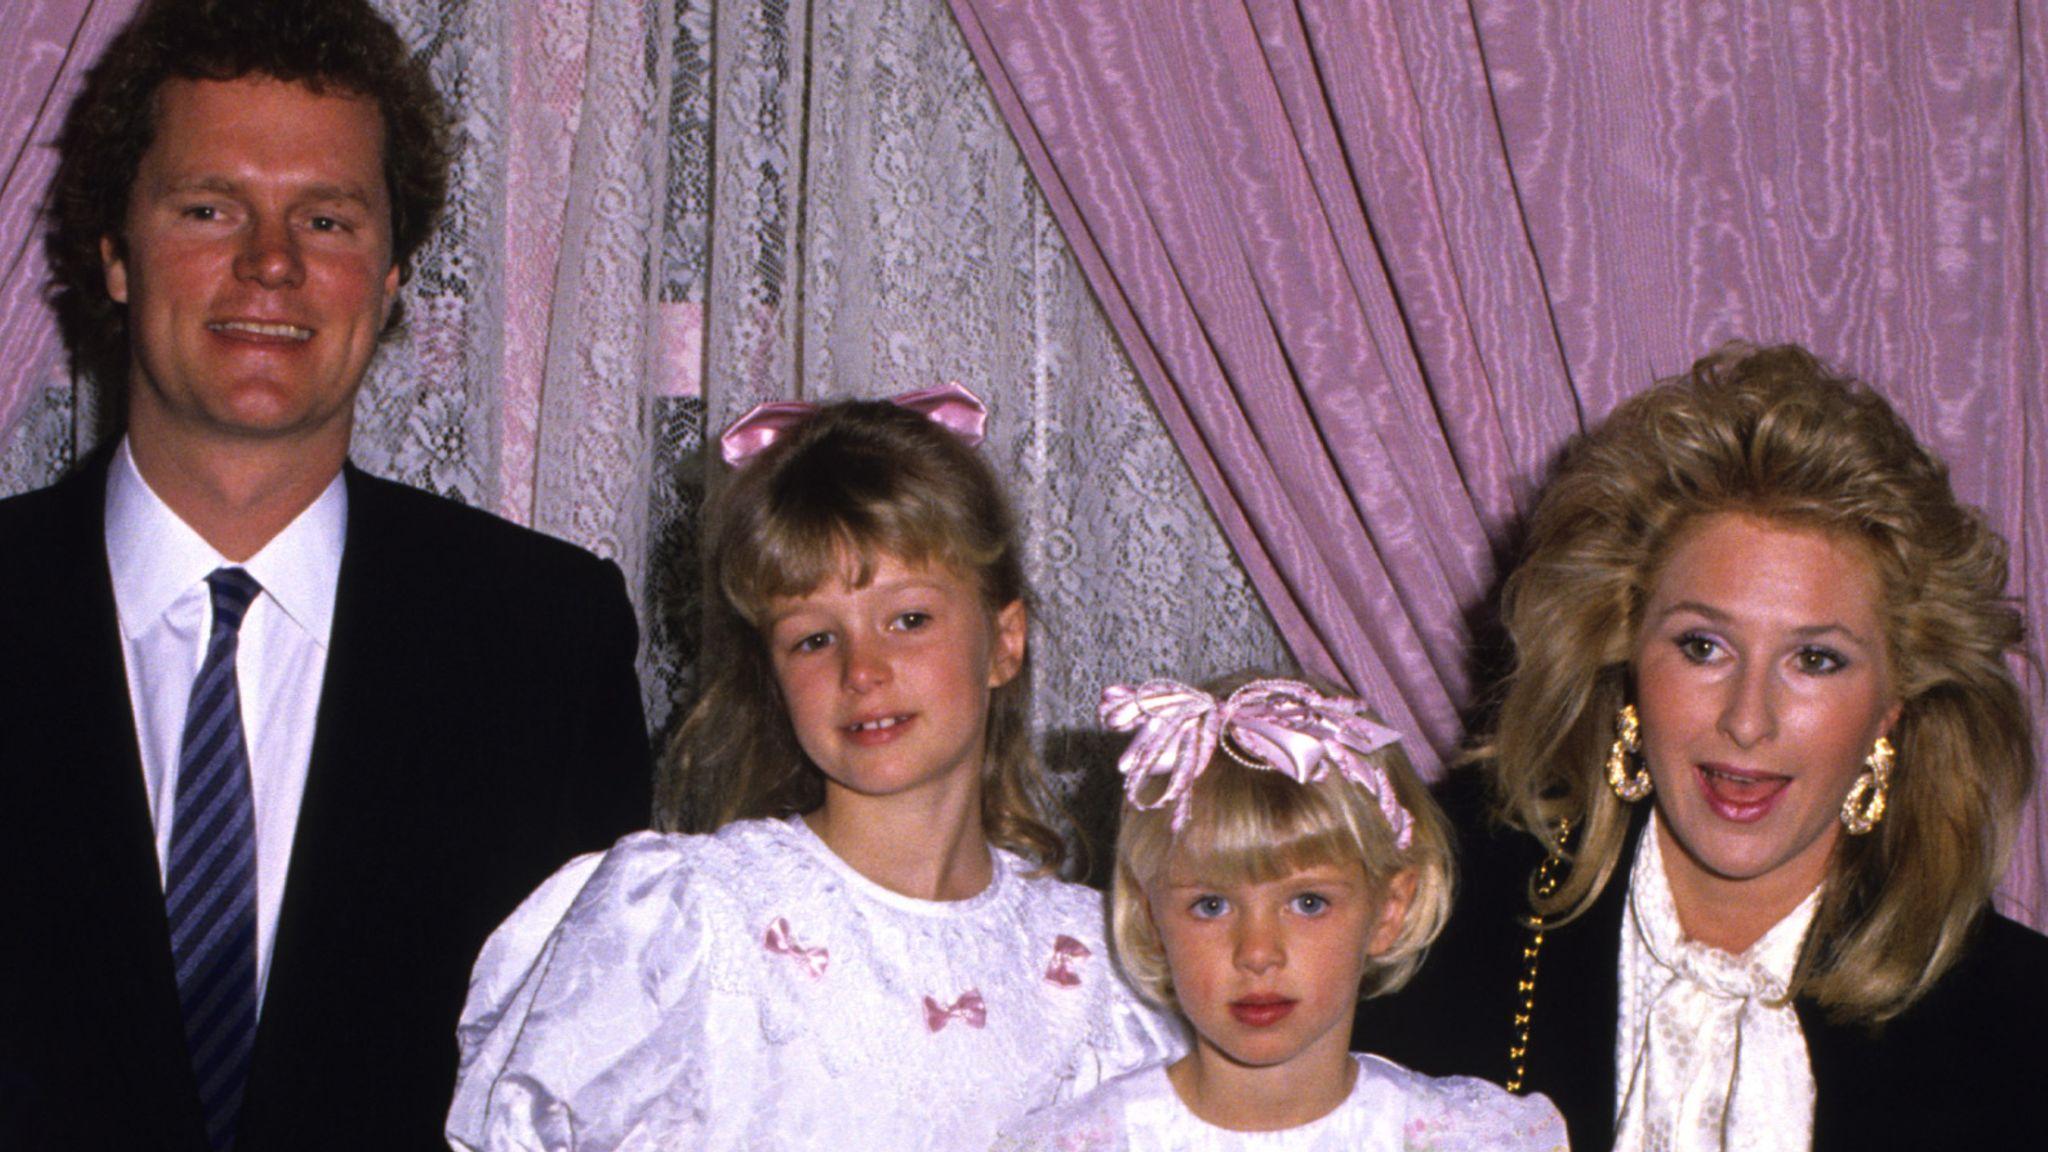 Rick Hilton, Paris Hilton, Nicky Hilton, and Kathy Hilton in 1990